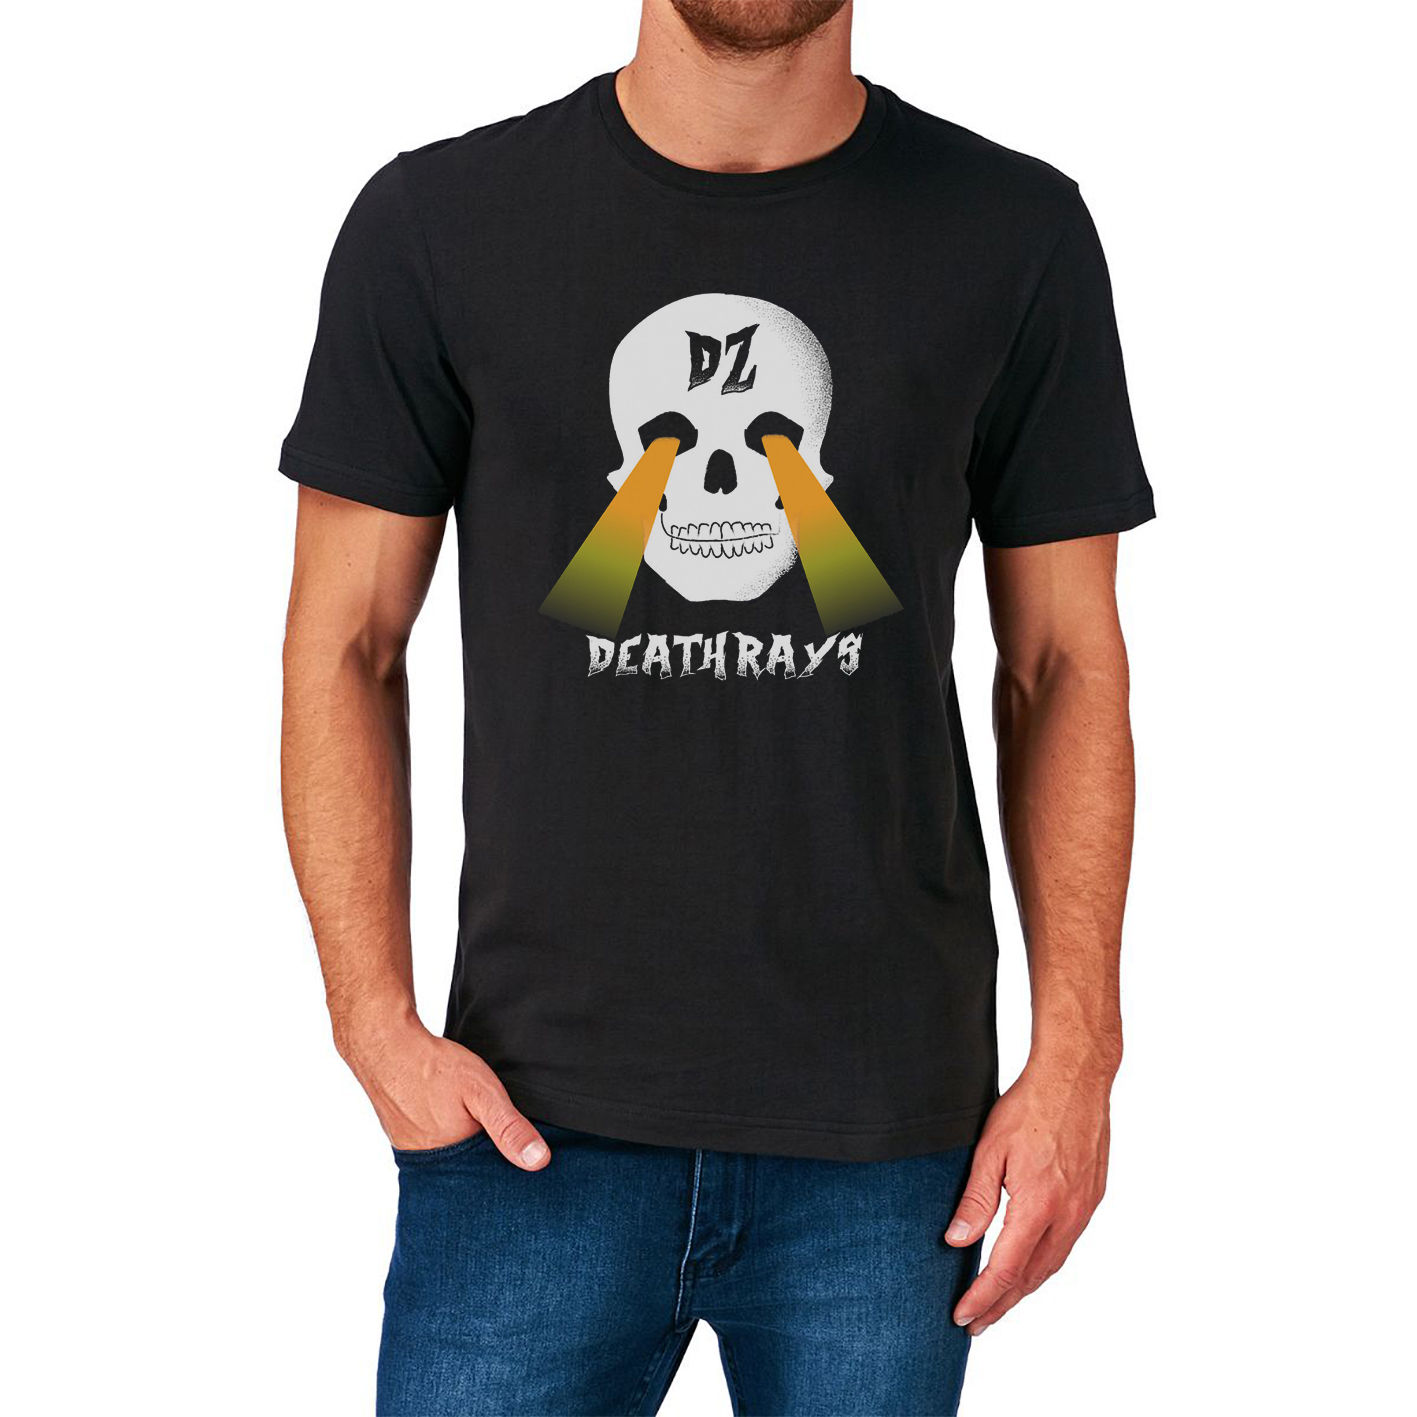 T shirt design queenstown - 2017 Summer Fashion Dz Deathraysdance Punk Heavy Metal Hard Rock Music Australia Design T Shirt Tops Fashion Tees